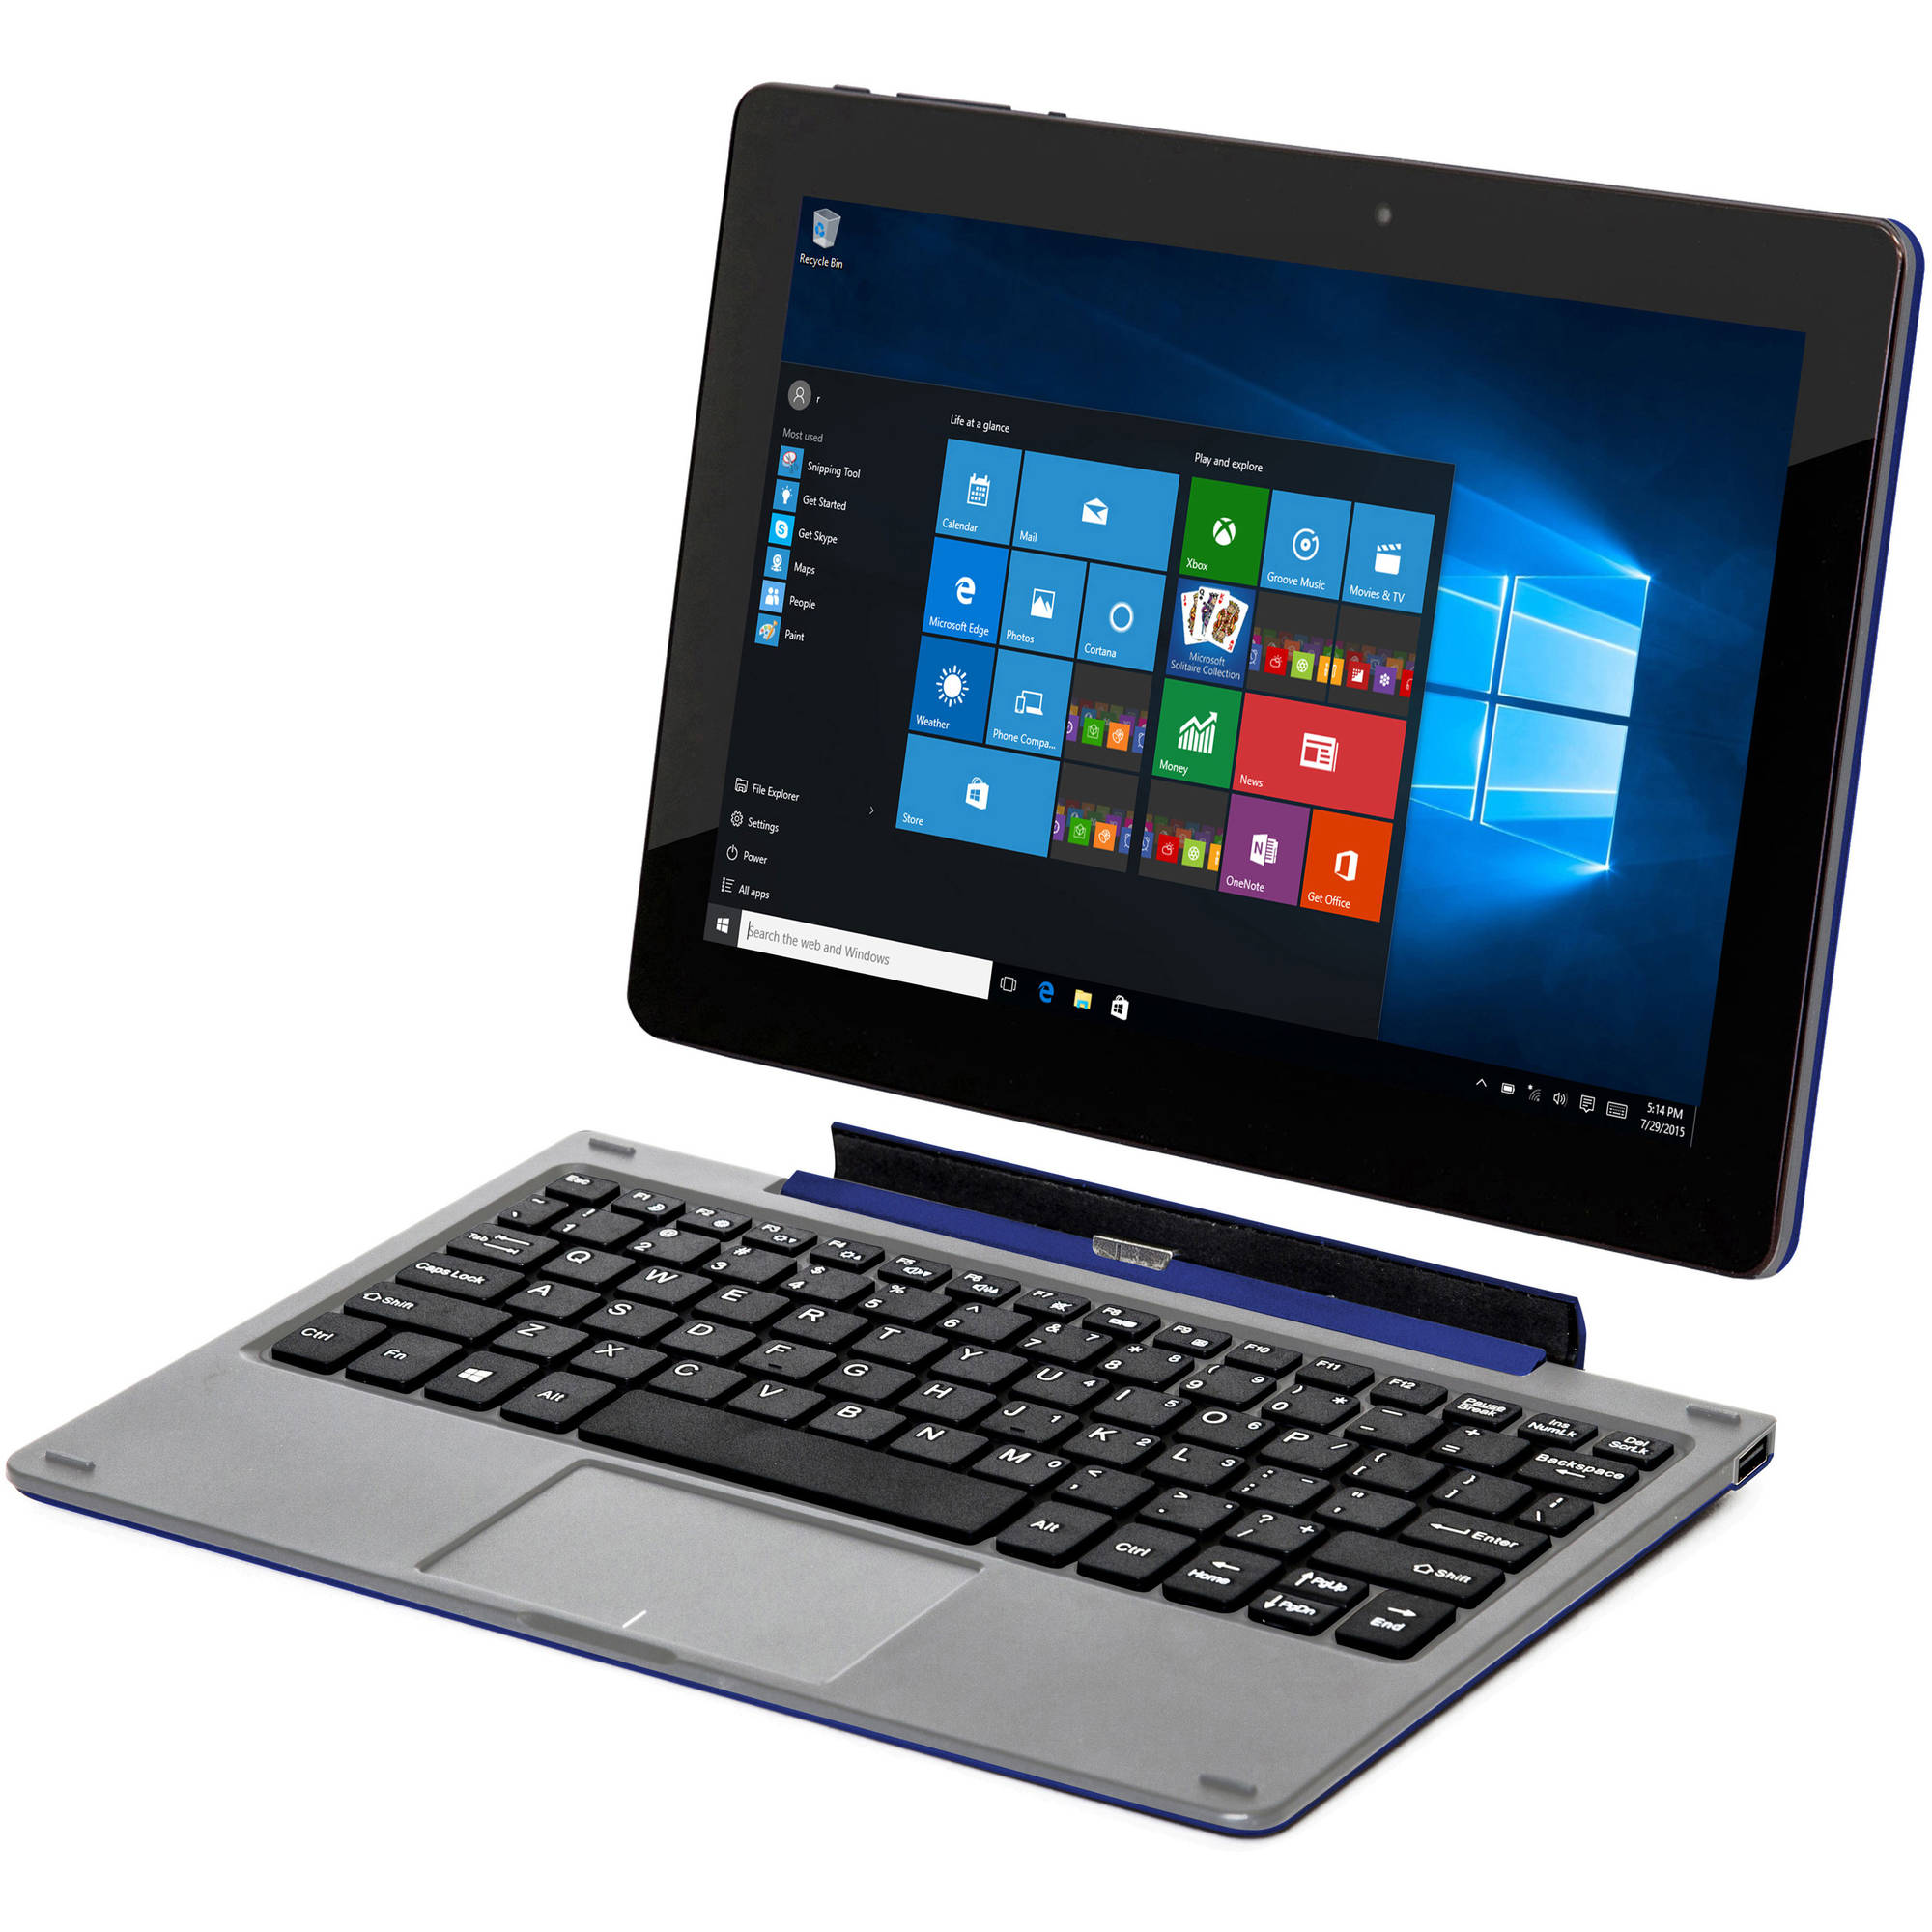 "Nextbook Flexx 10.1"" 2-in-1 Tablet 32GB Intel Atom Z3735F ..."